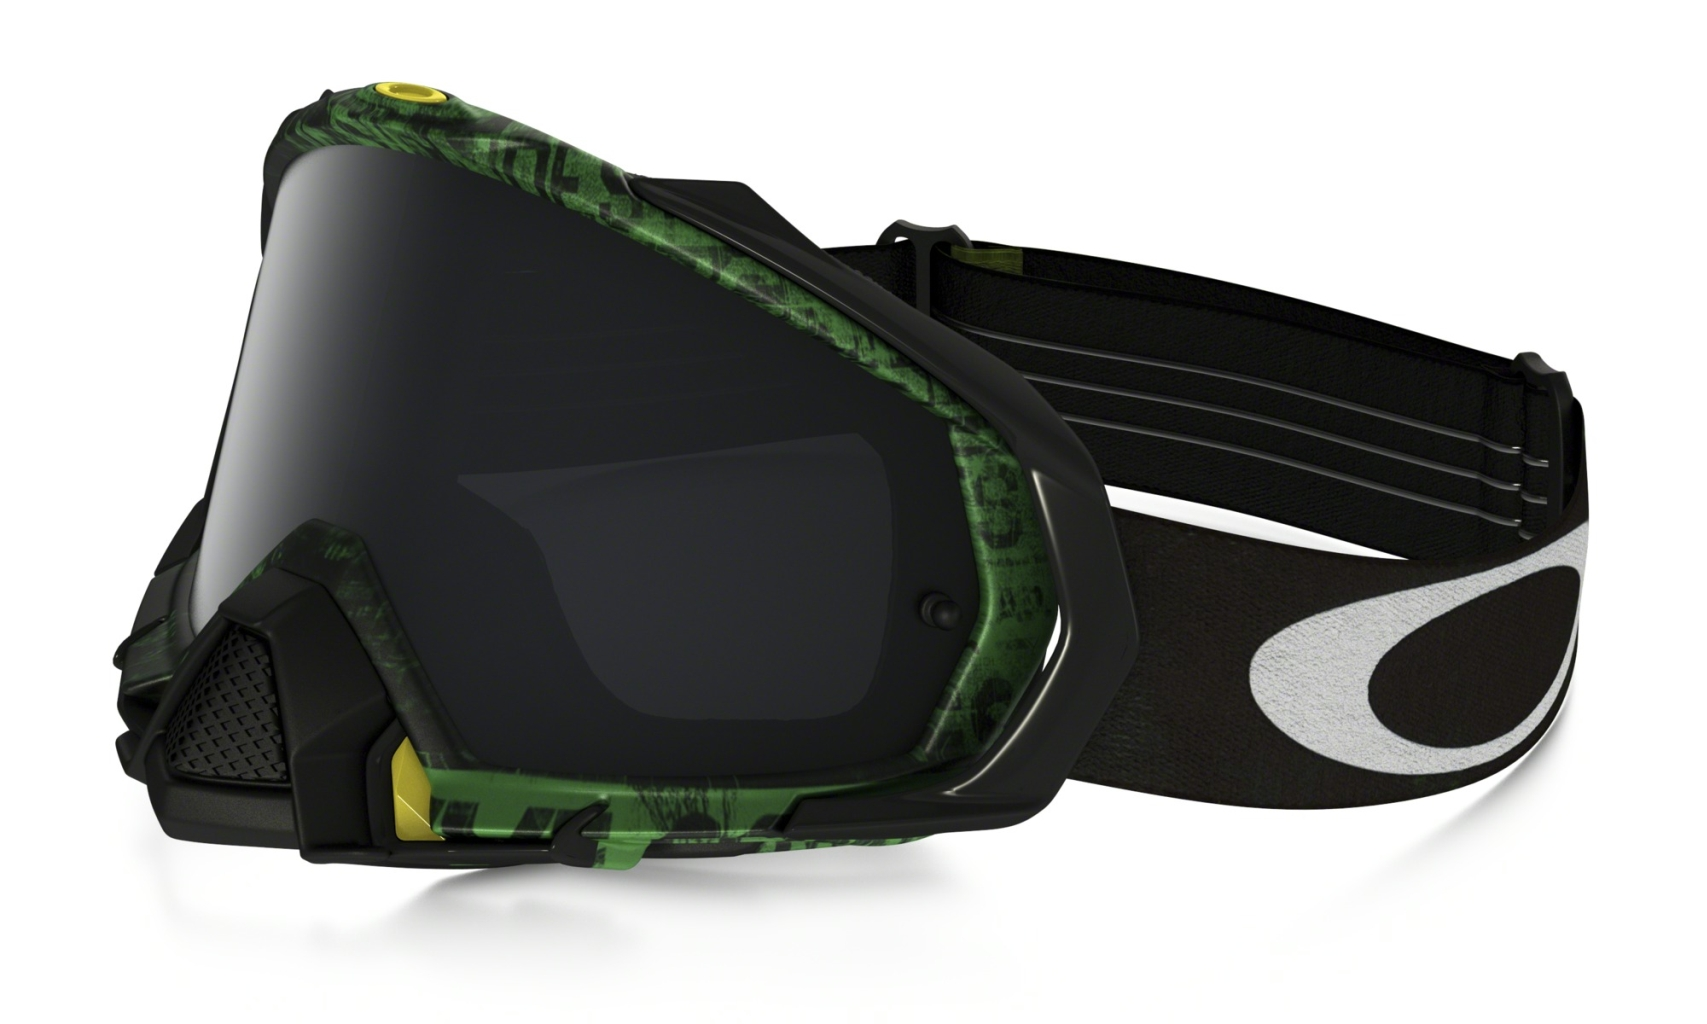 Oakley Mayhem Pro Mx-30